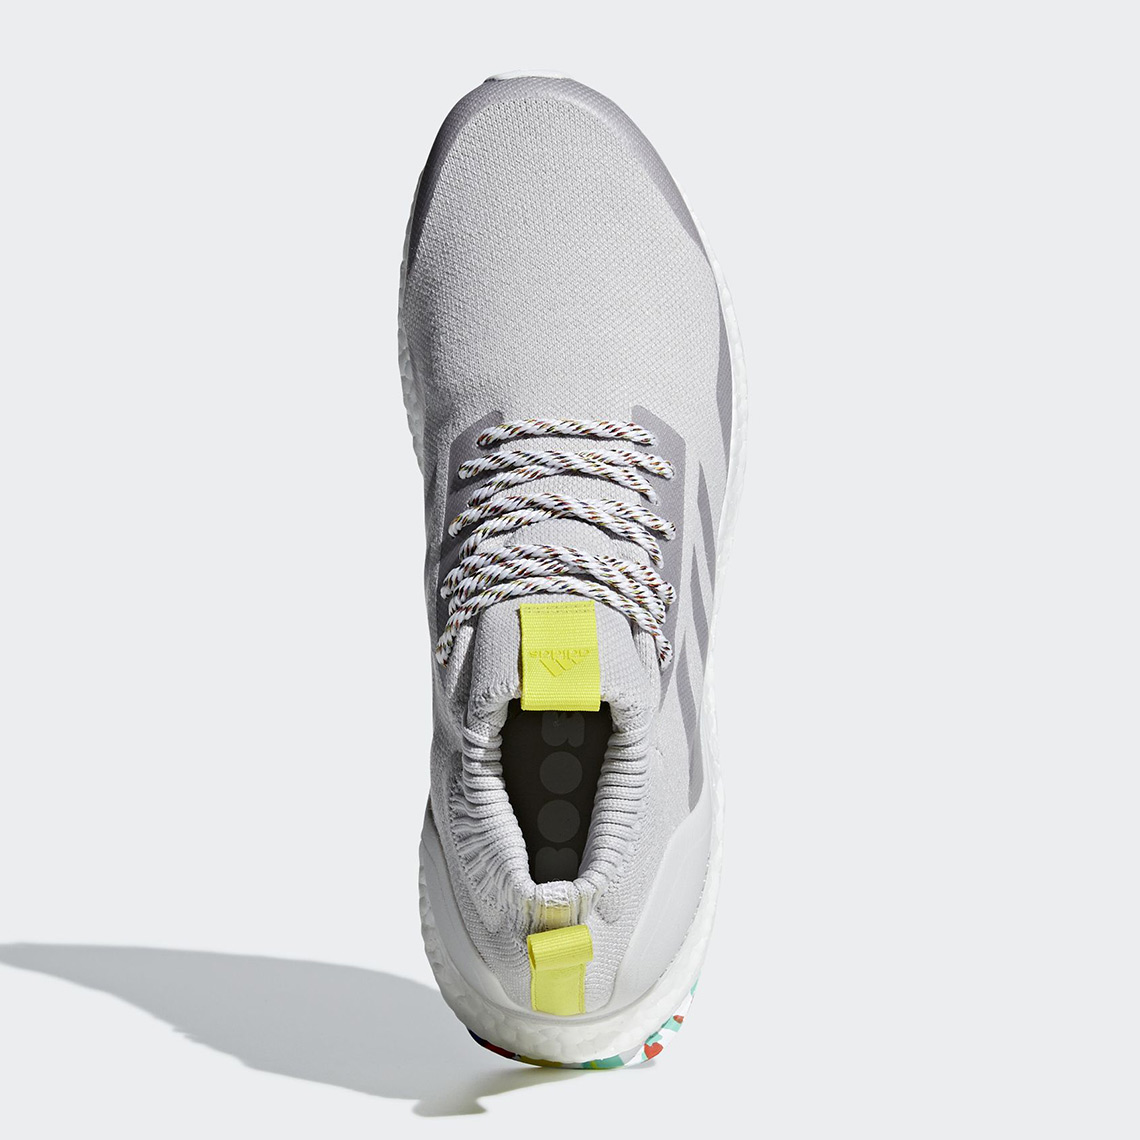 adidas Ultra Boost Mid G26841 + G26842